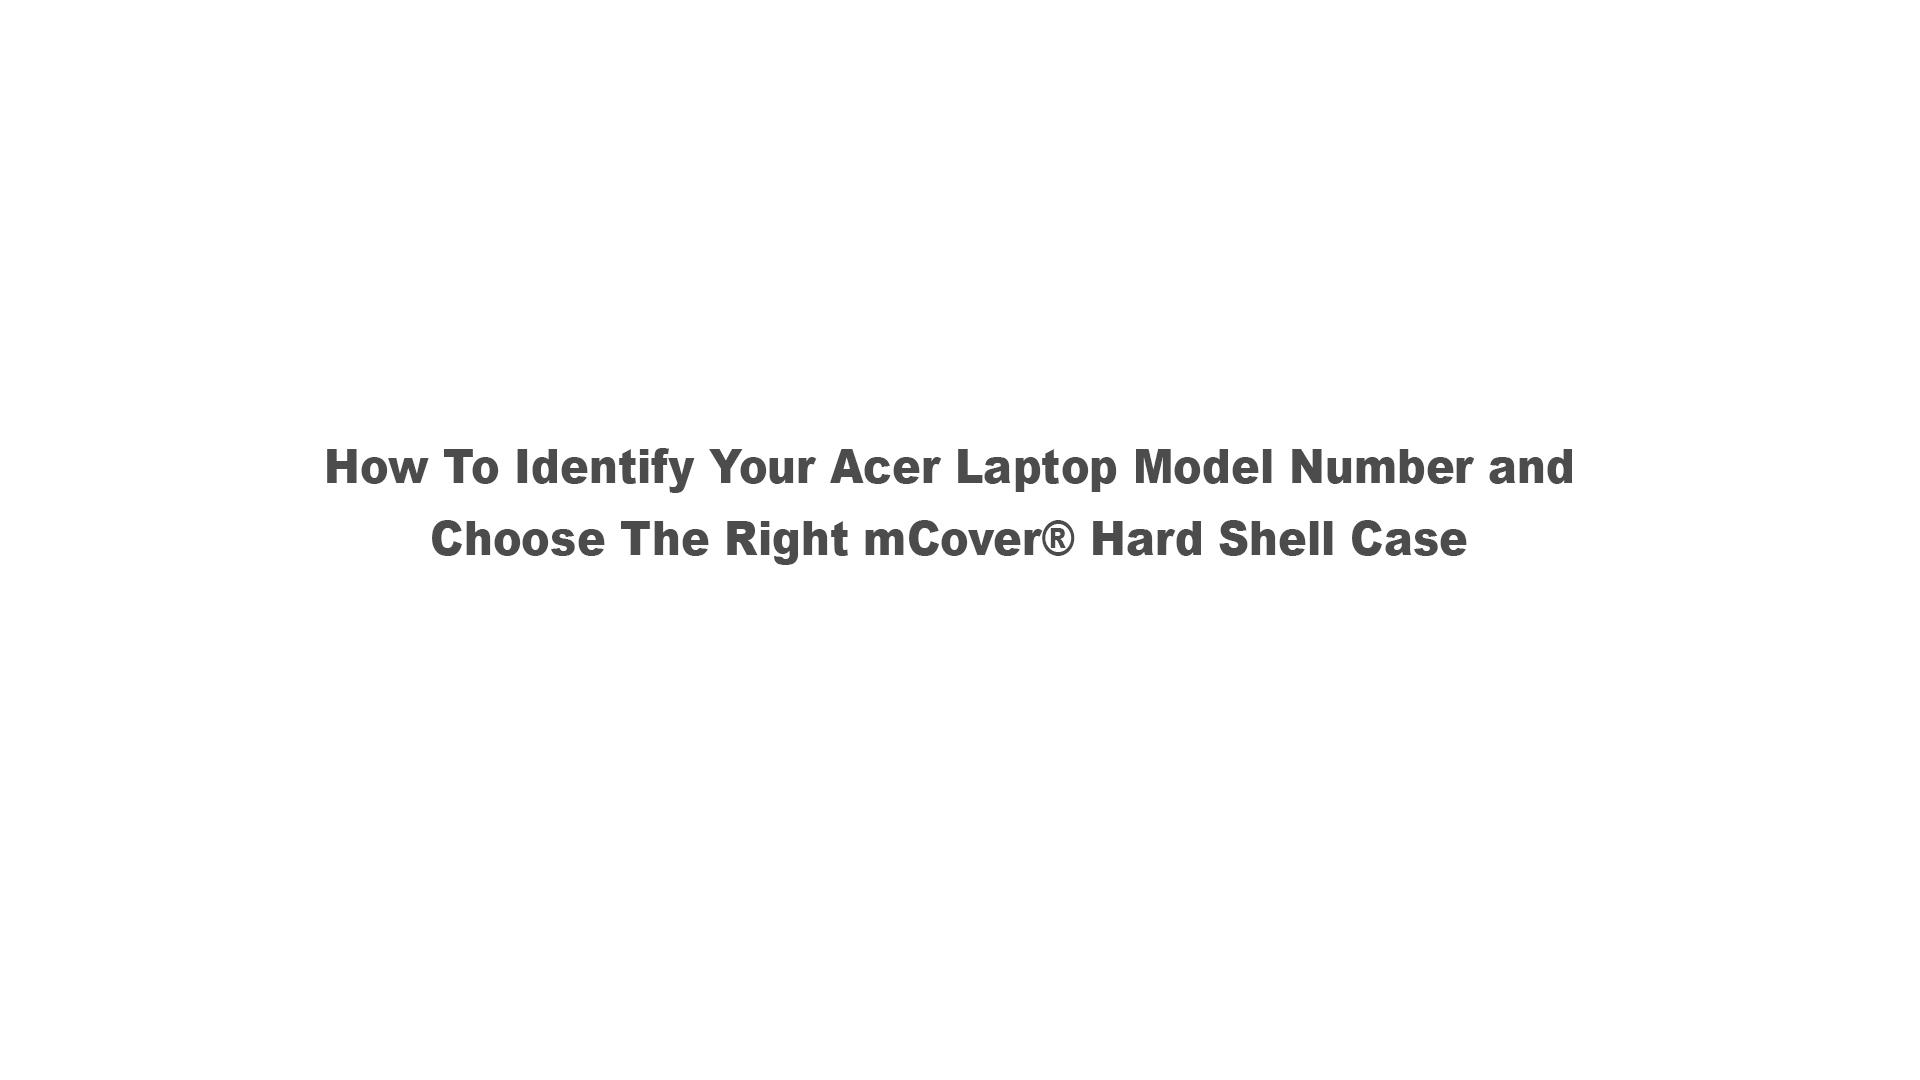 "iPearl mCover Hard Shell Case for 14"" Acer Chromebook 14 CB3-431 Series Laptop (Aqua)"